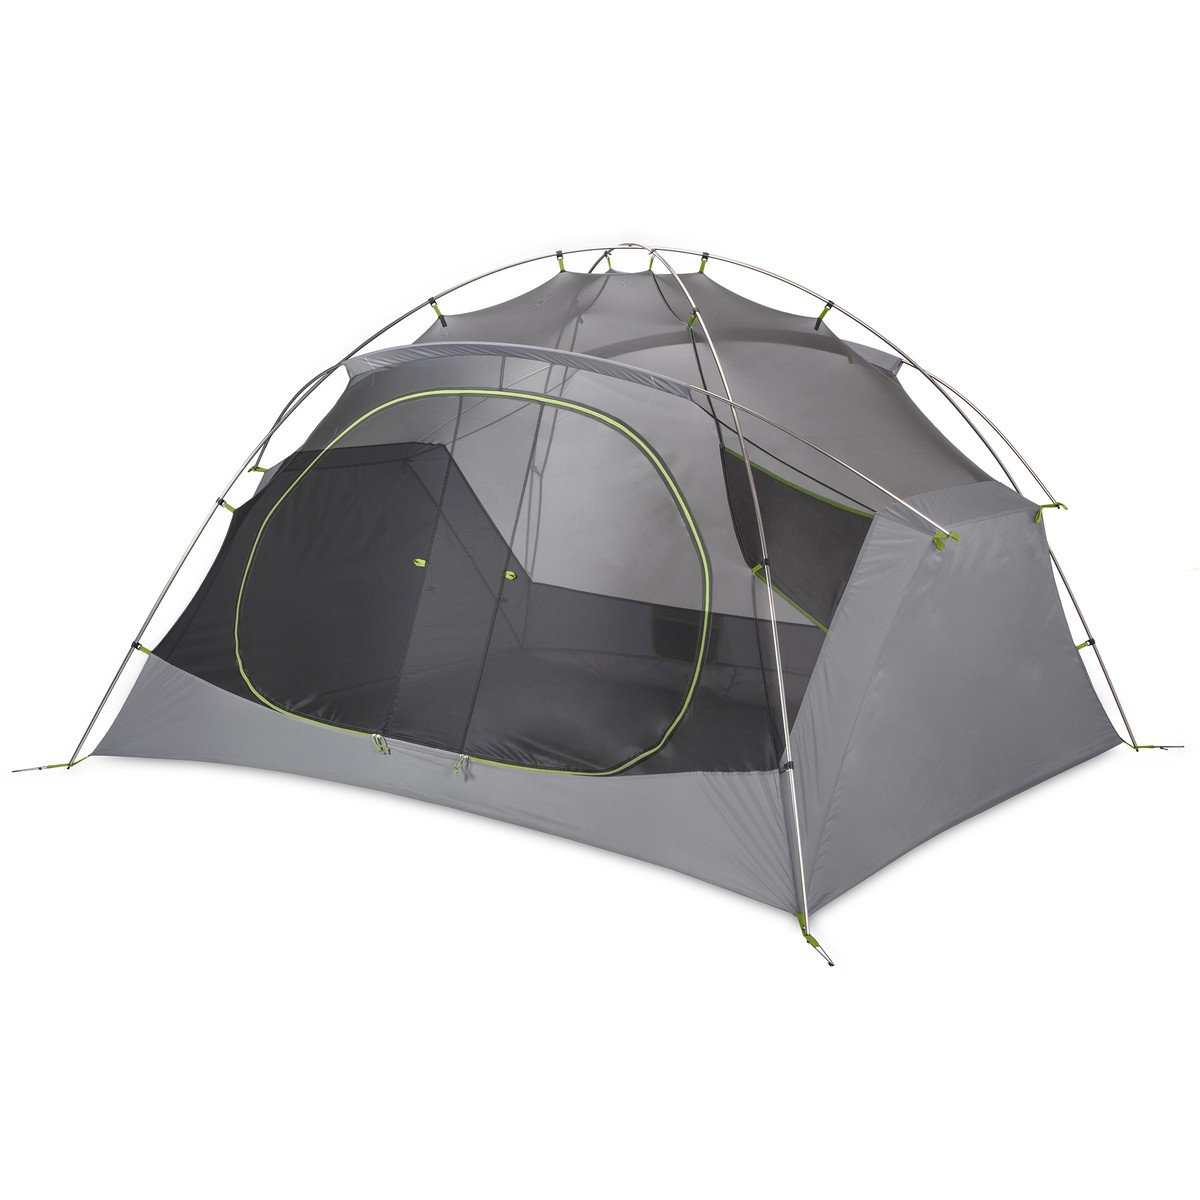 Amazon.com  NEMO Bungalow 4P C&ing Tent Birch Leaf Green  Sports u0026 Outdoors  sc 1 st  Amazon.com & Amazon.com : NEMO Bungalow 4P Camping Tent Birch Leaf Green ...